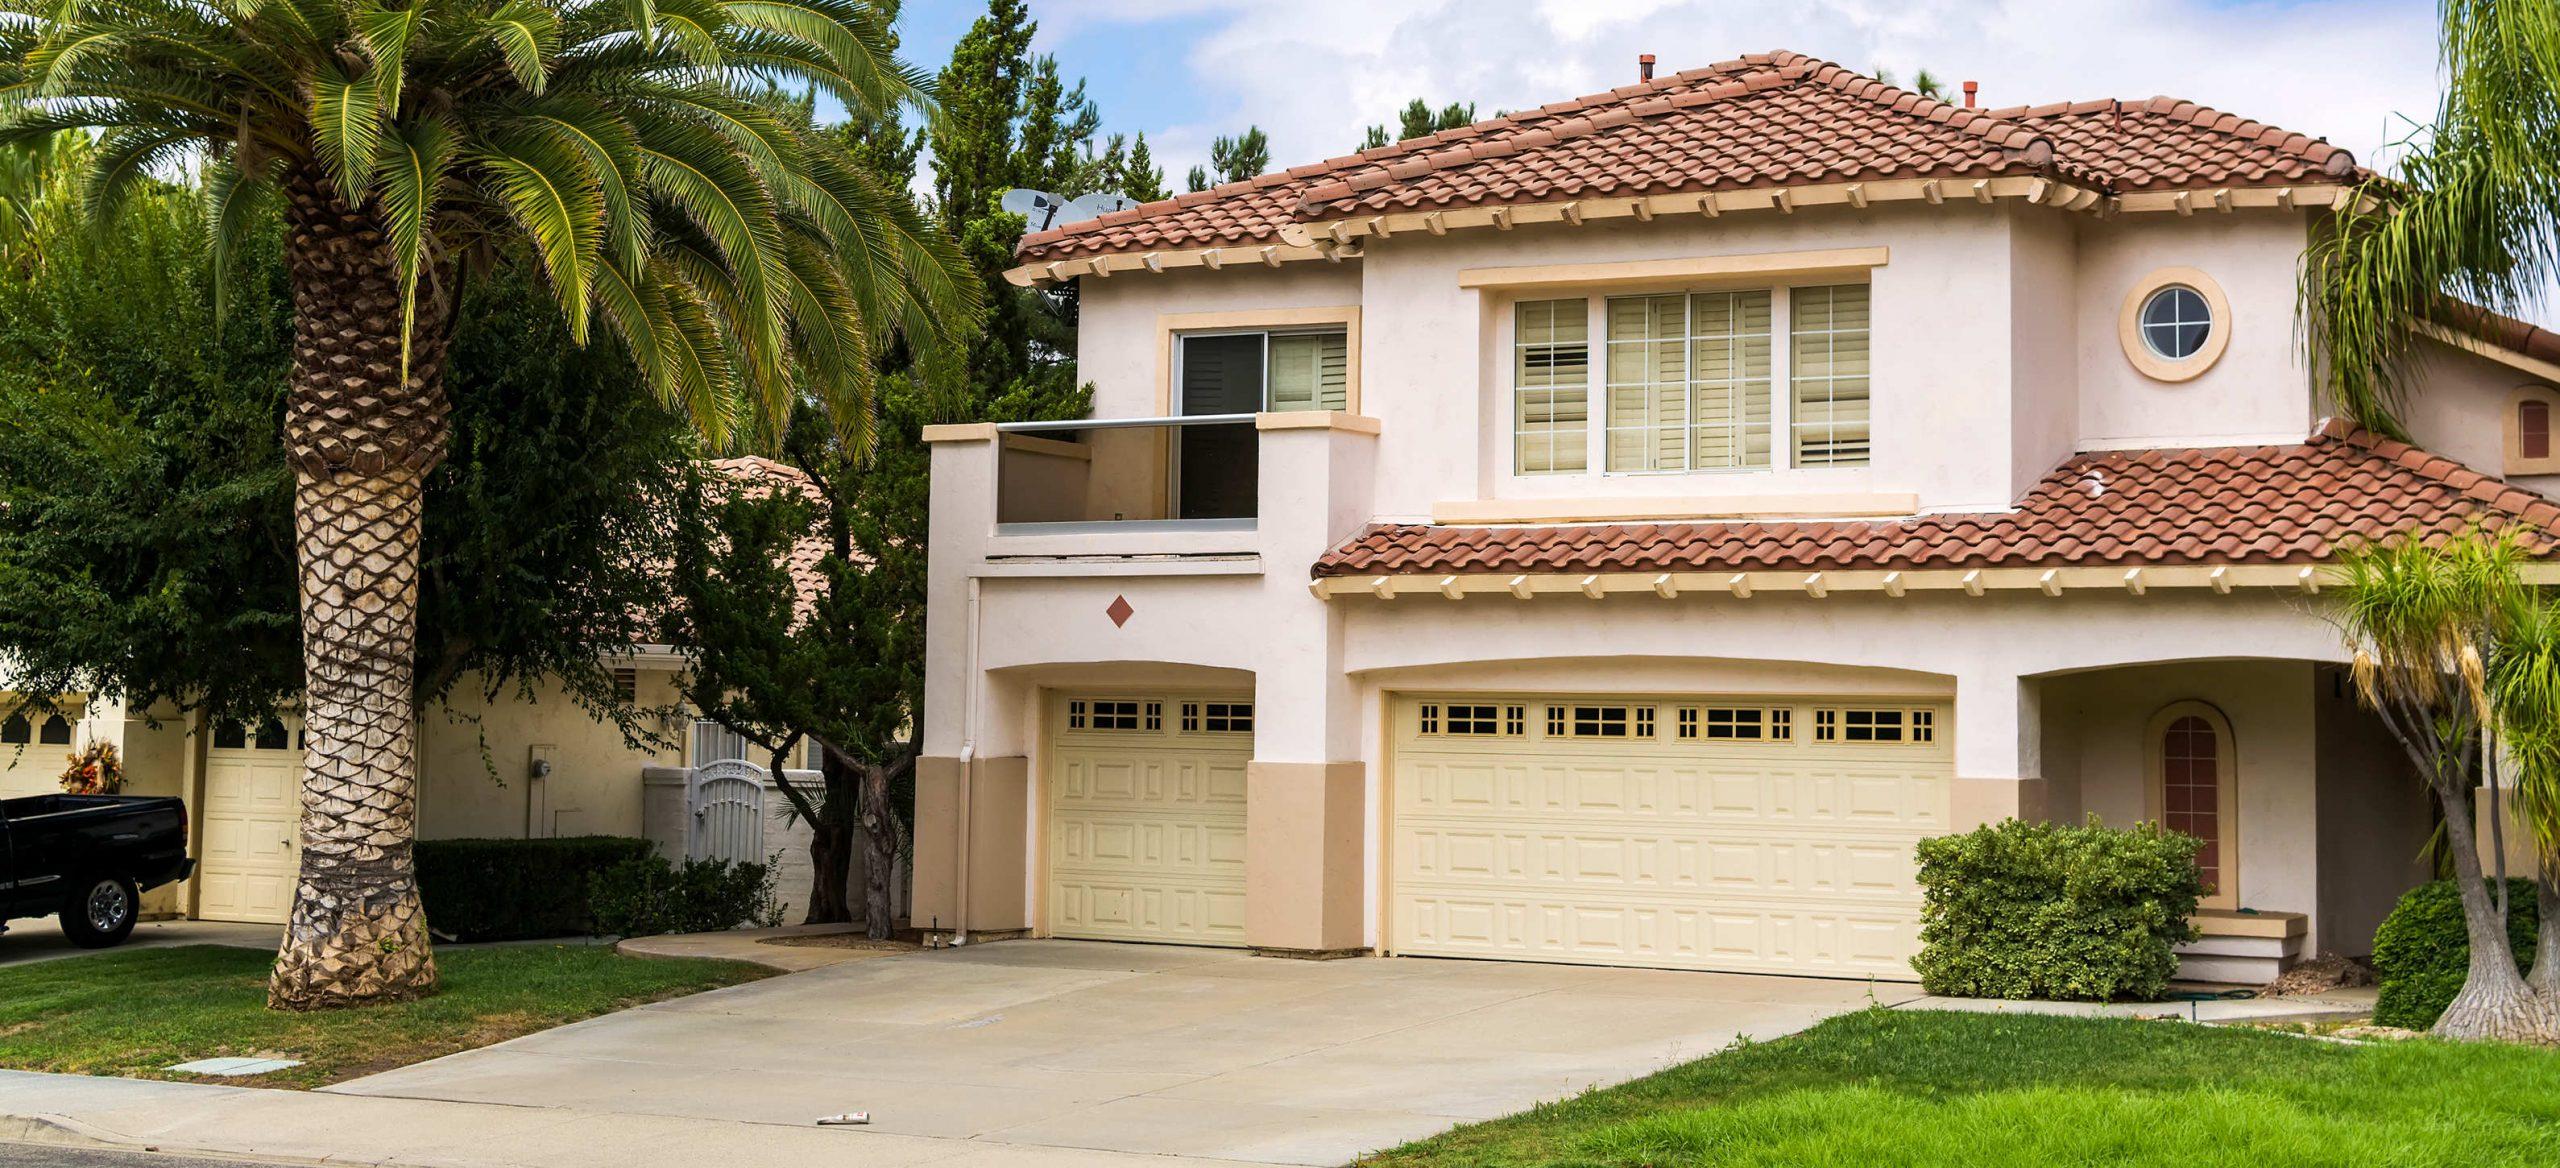 Top Three Money Saving Home Improvements